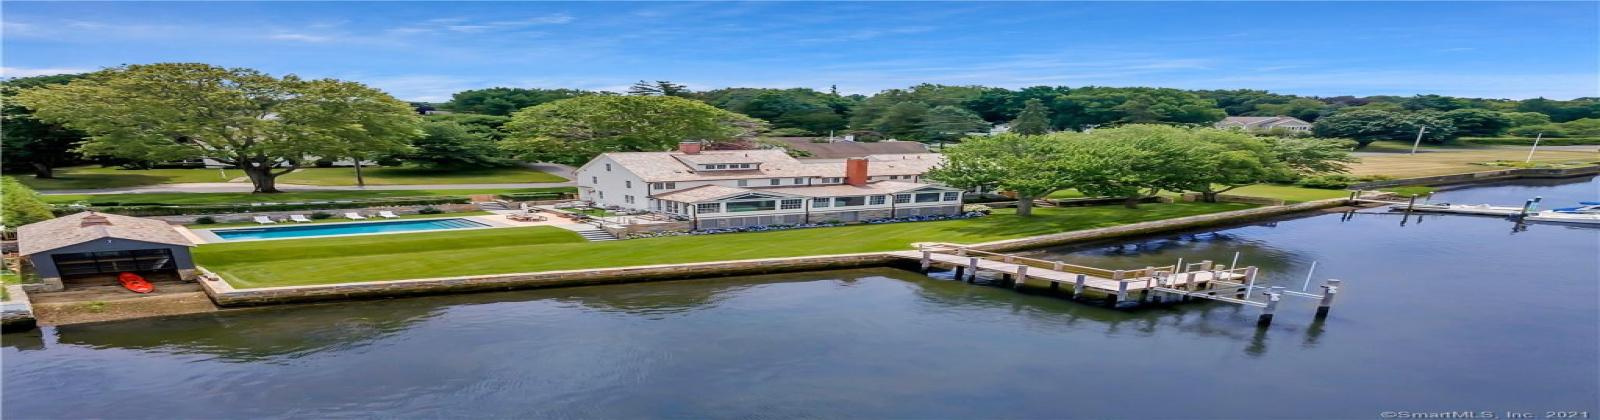 91 North Cove Road, Connecticut 06475, 6 Bedrooms Bedrooms, ,6 BathroomsBathrooms,Villa,For Sale,North Cove Road,1001